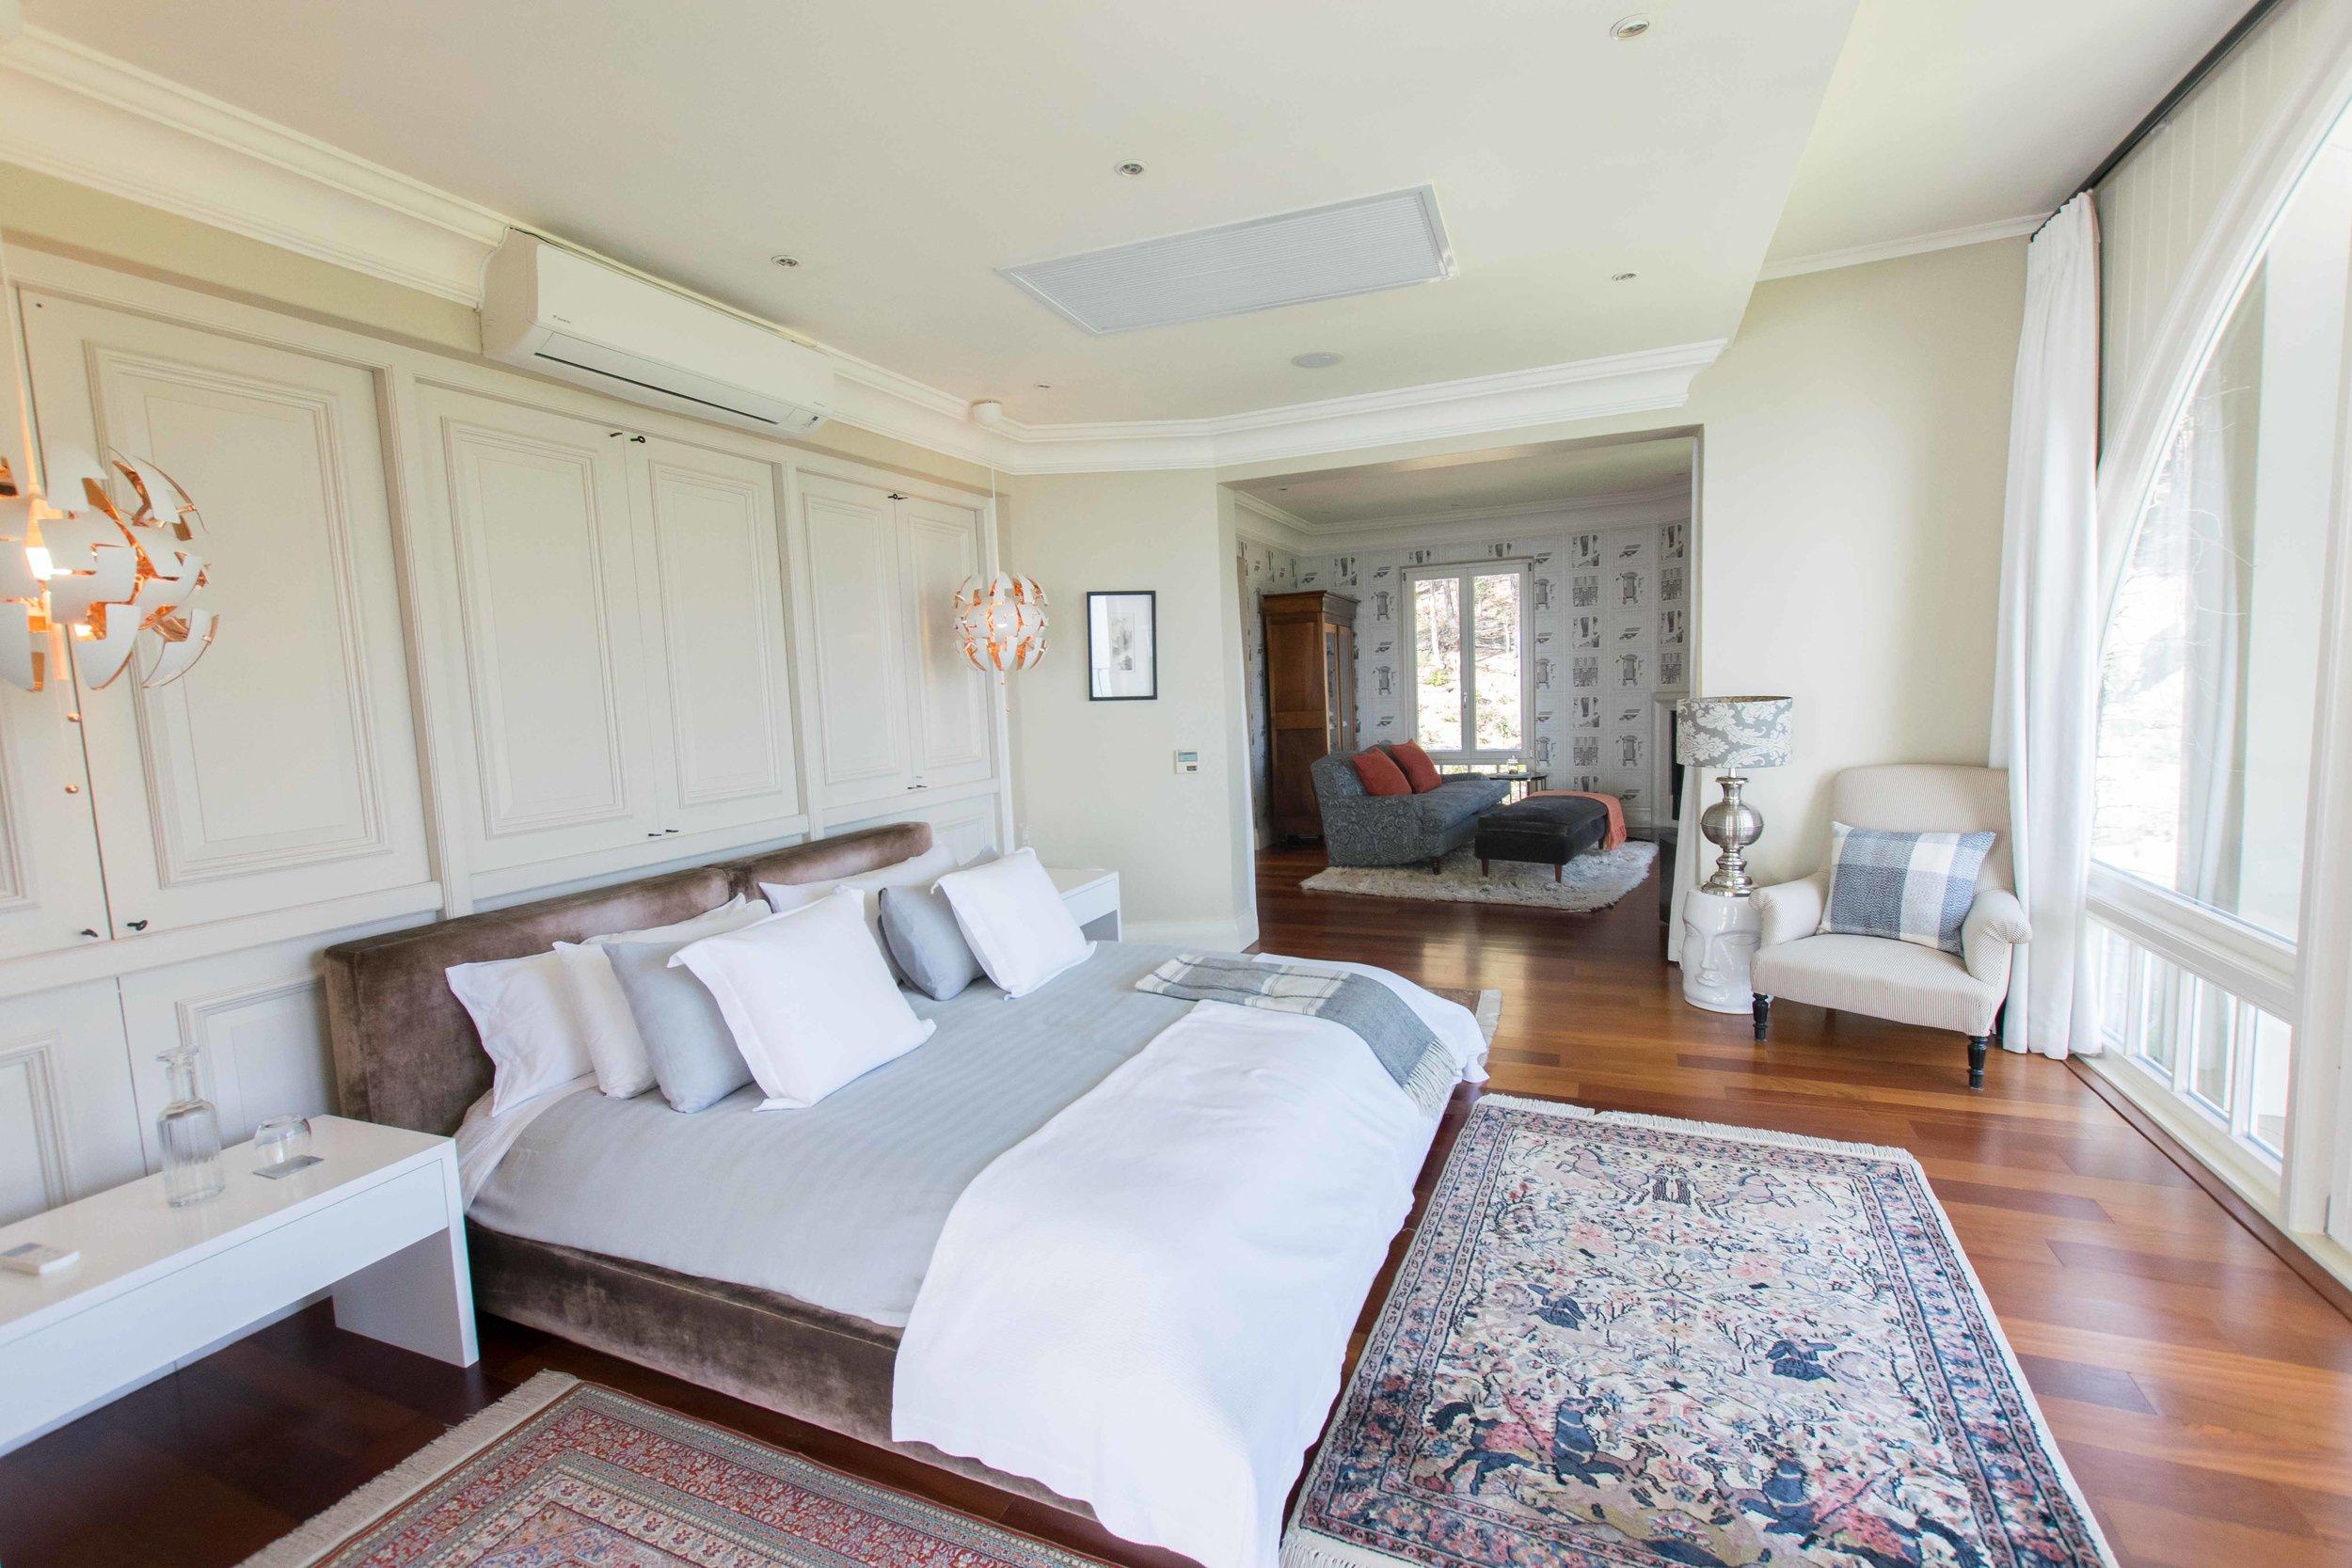 Penthouse bedroom at 21 Nettleton